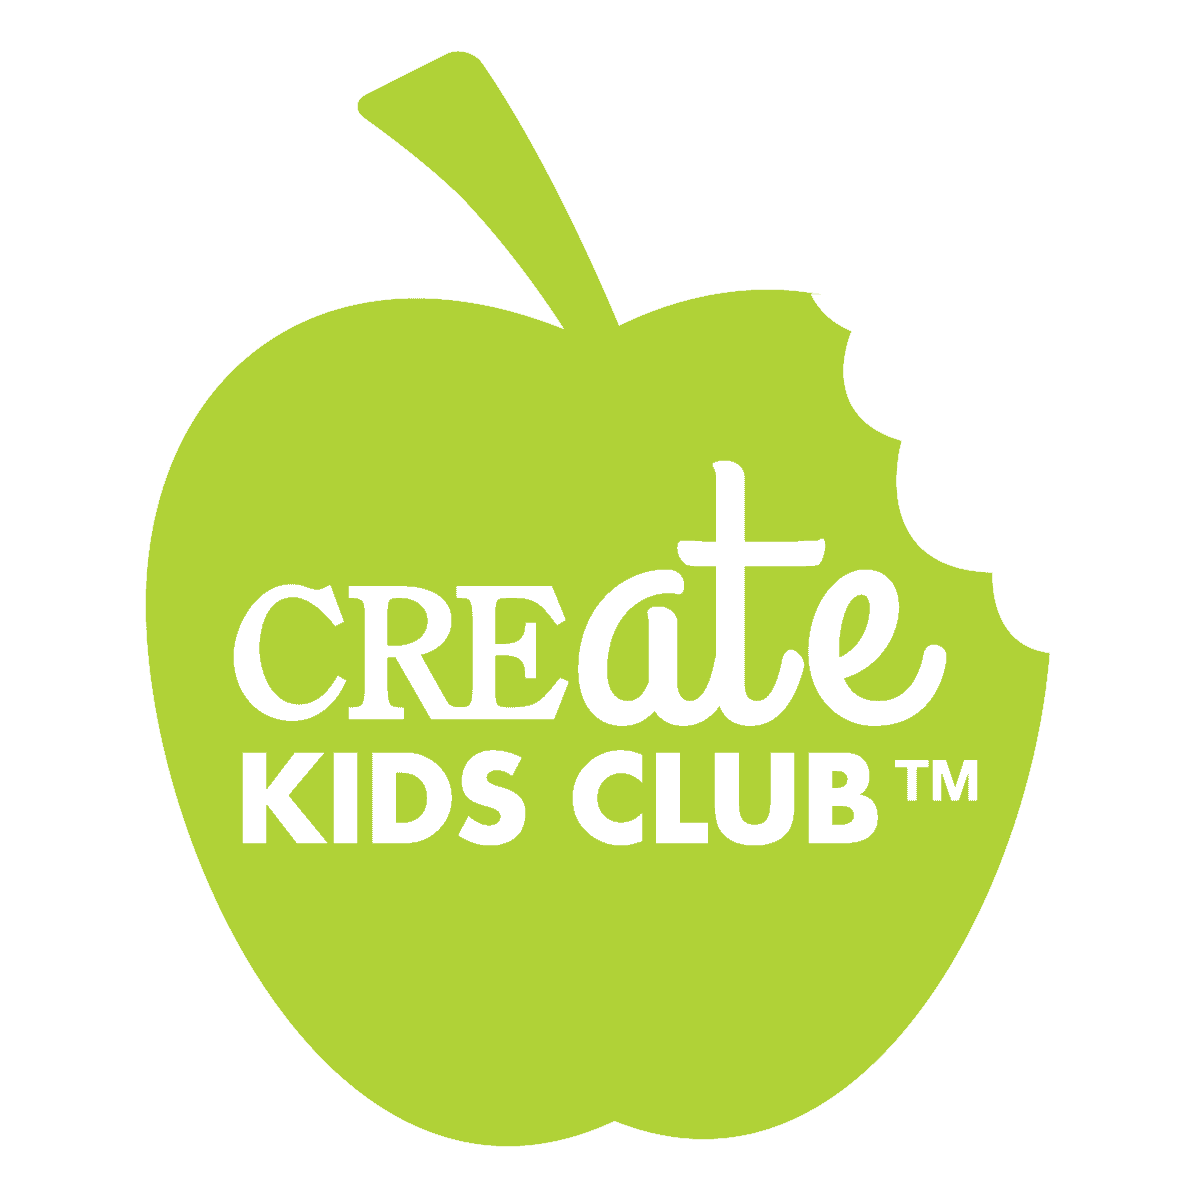 create kids club apple Logo